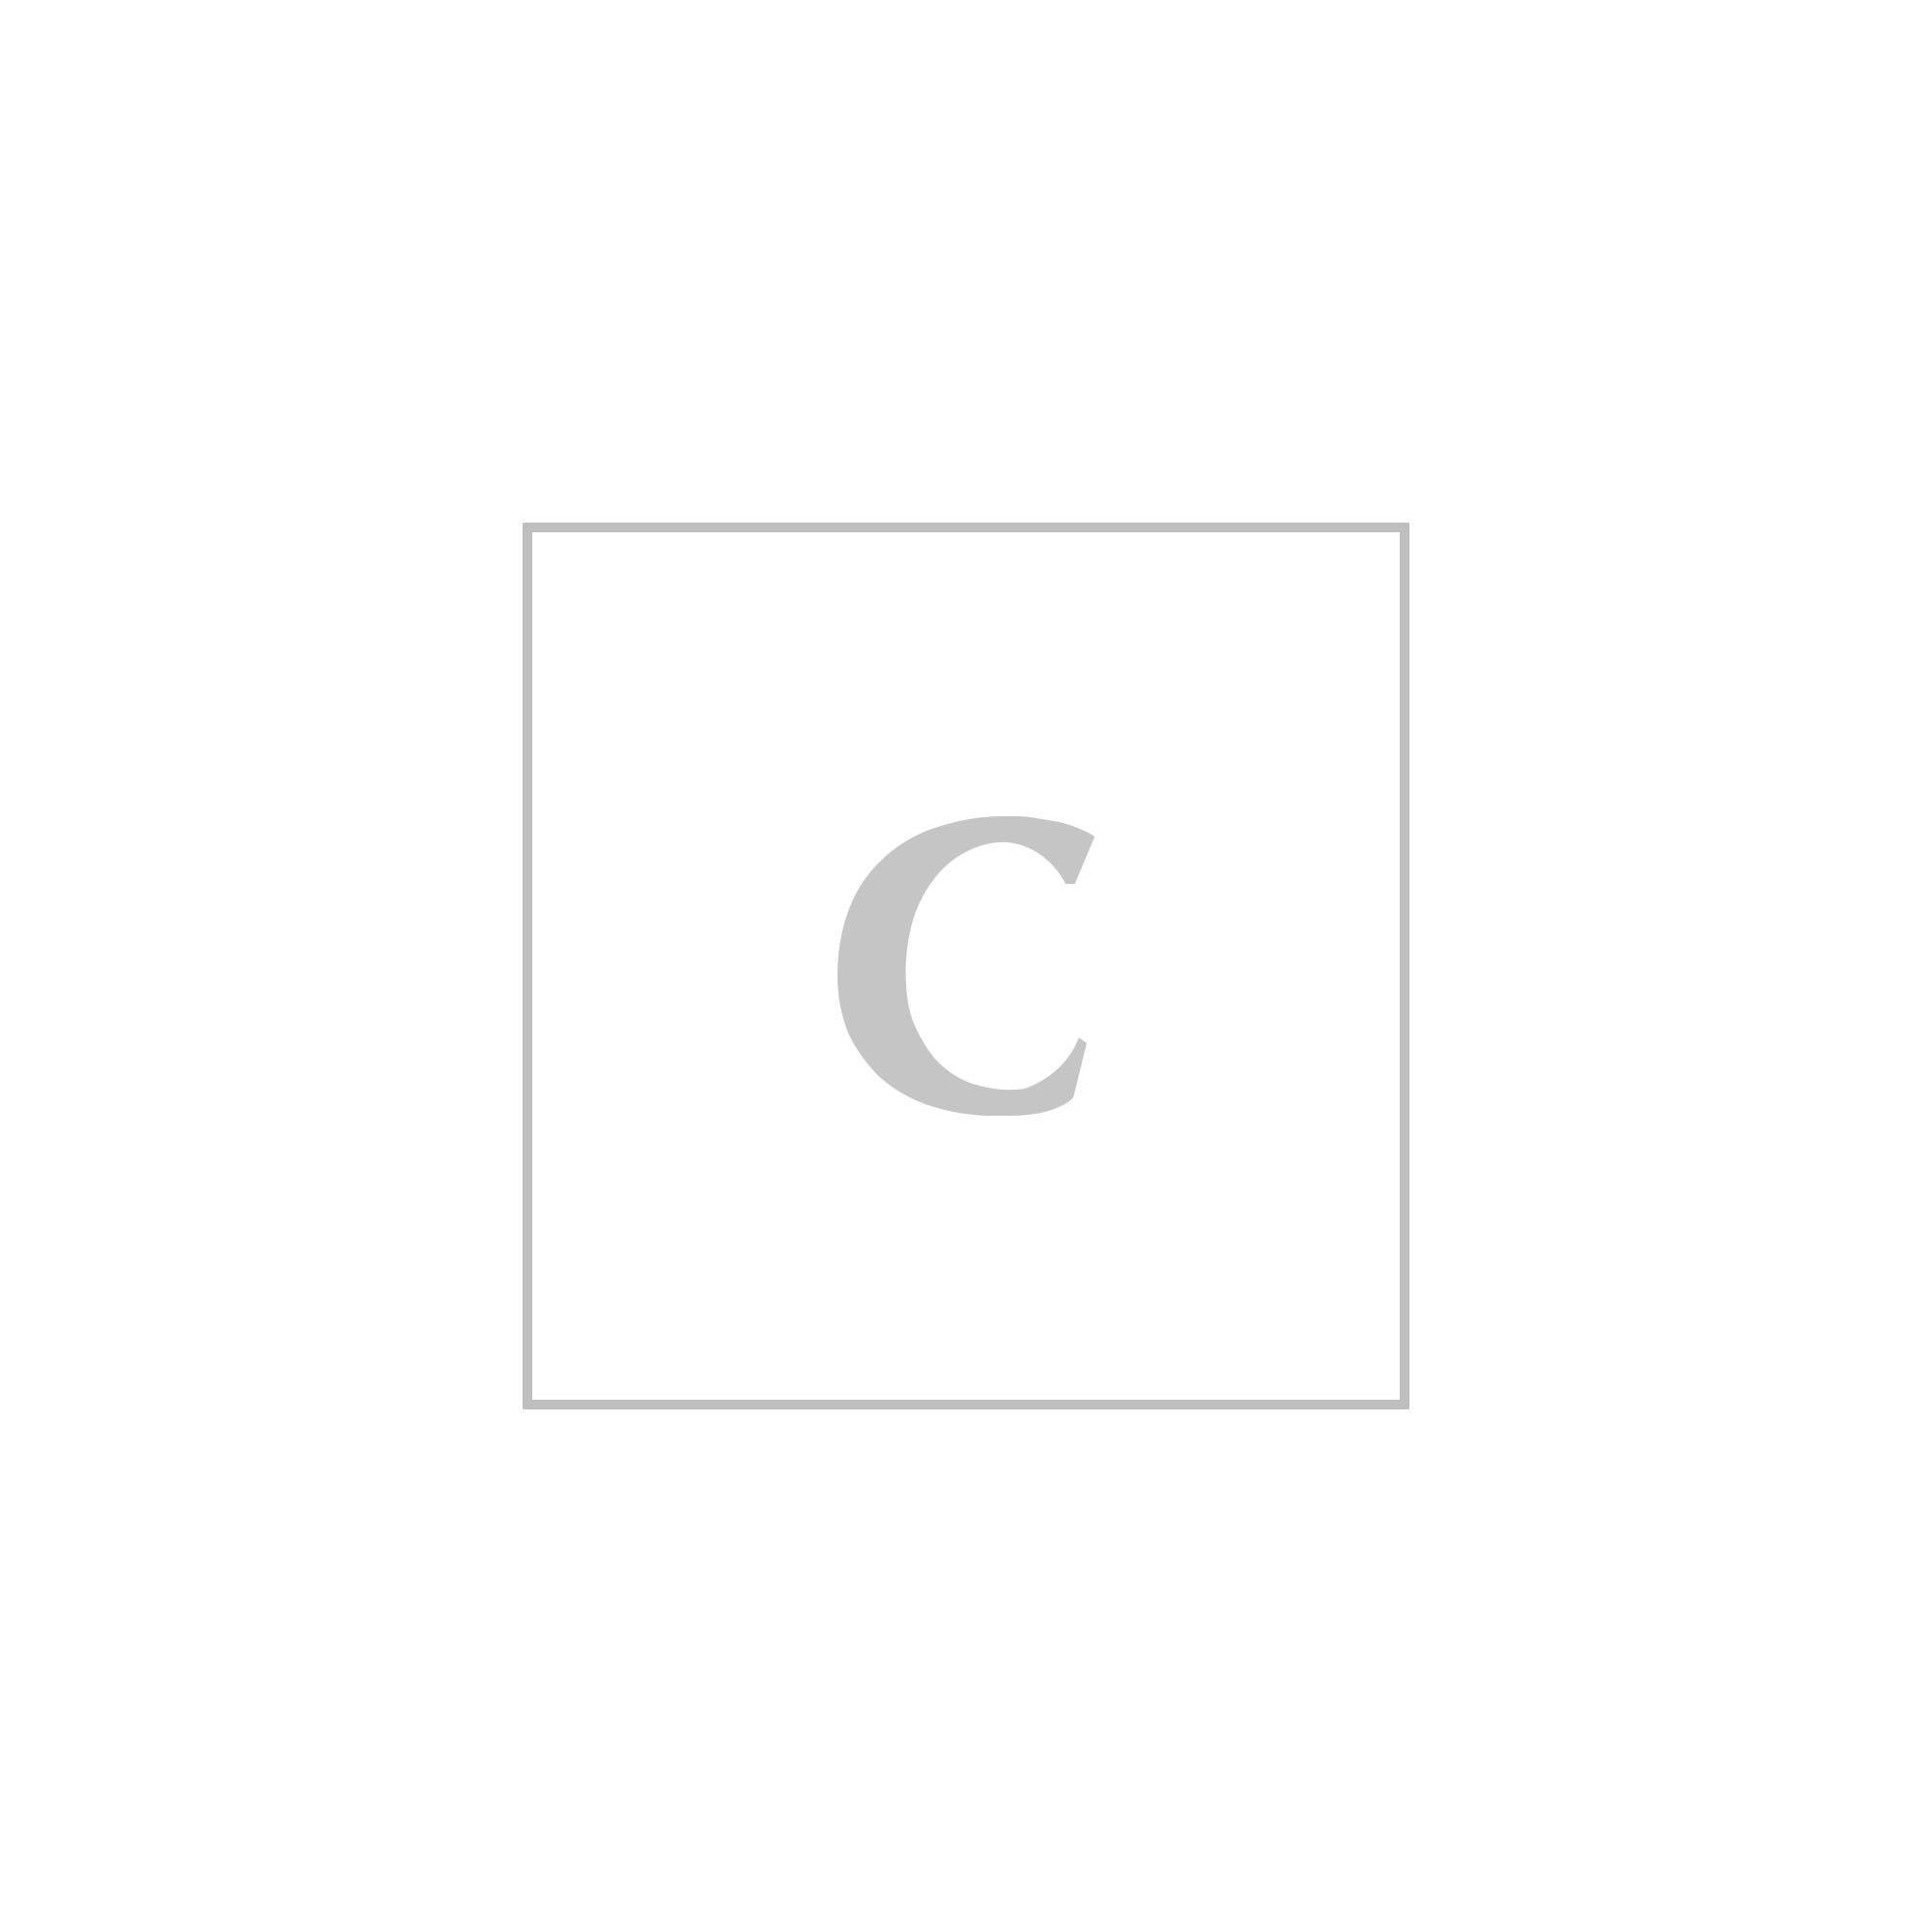 Burberry espadrilles carlson